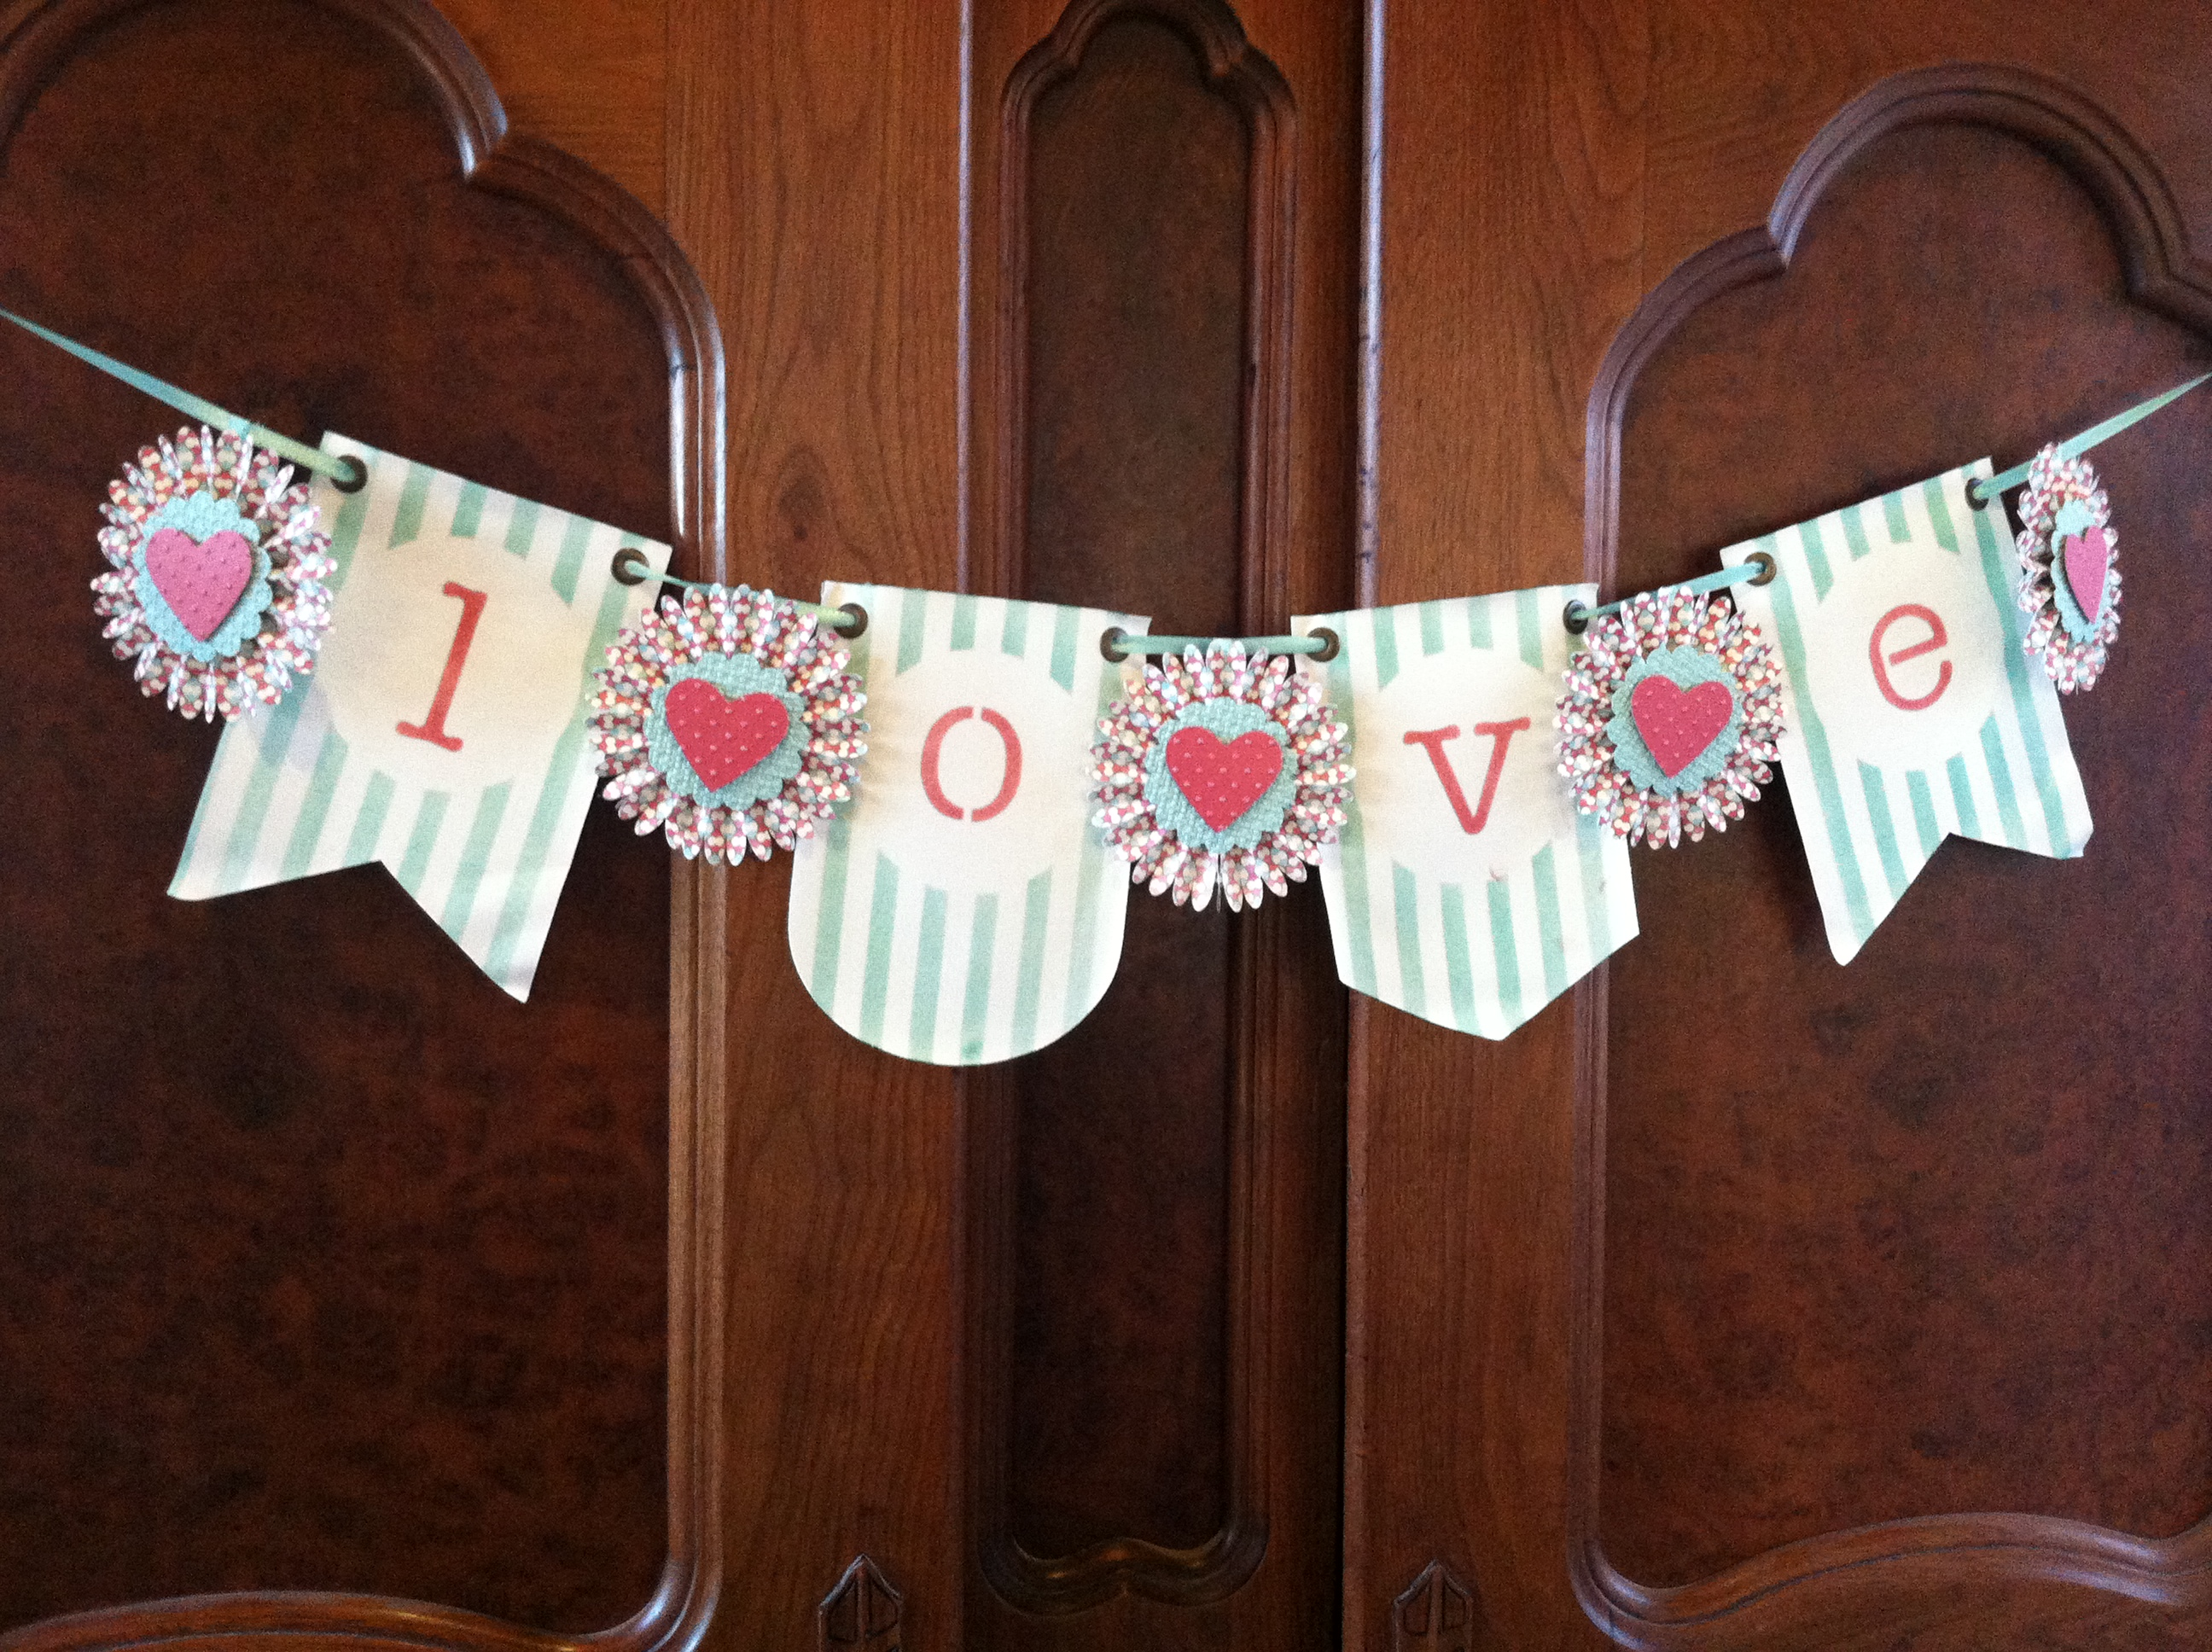 LOVE Banner for Valentine's Day